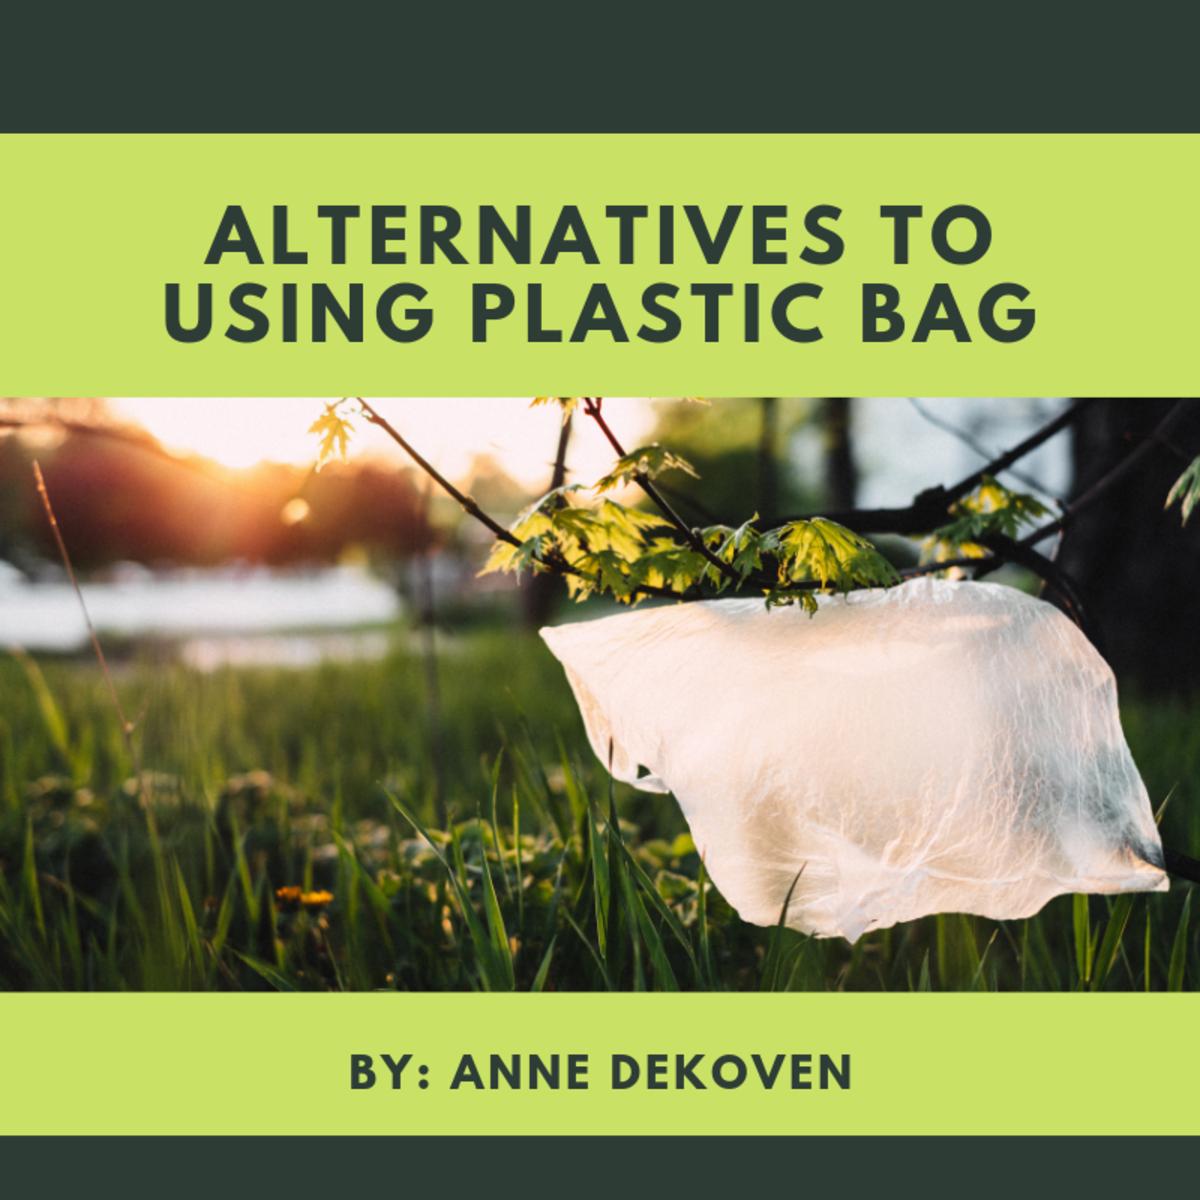 Alternatives to Using Plastic Bag